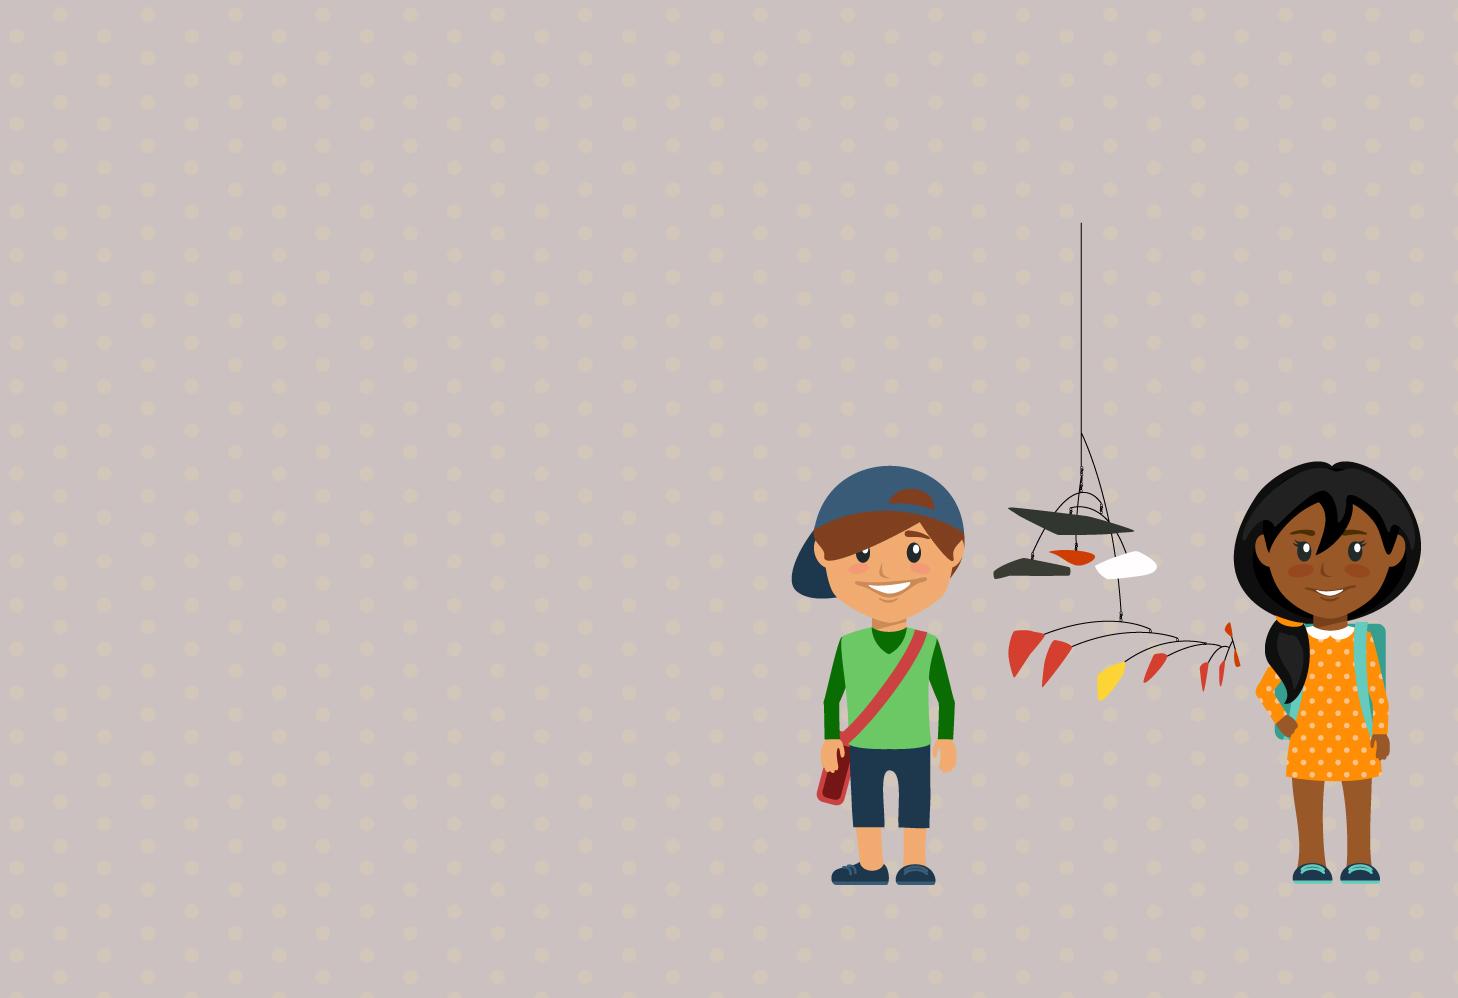 Creative Arts 4 KIDS × Alexander Calder